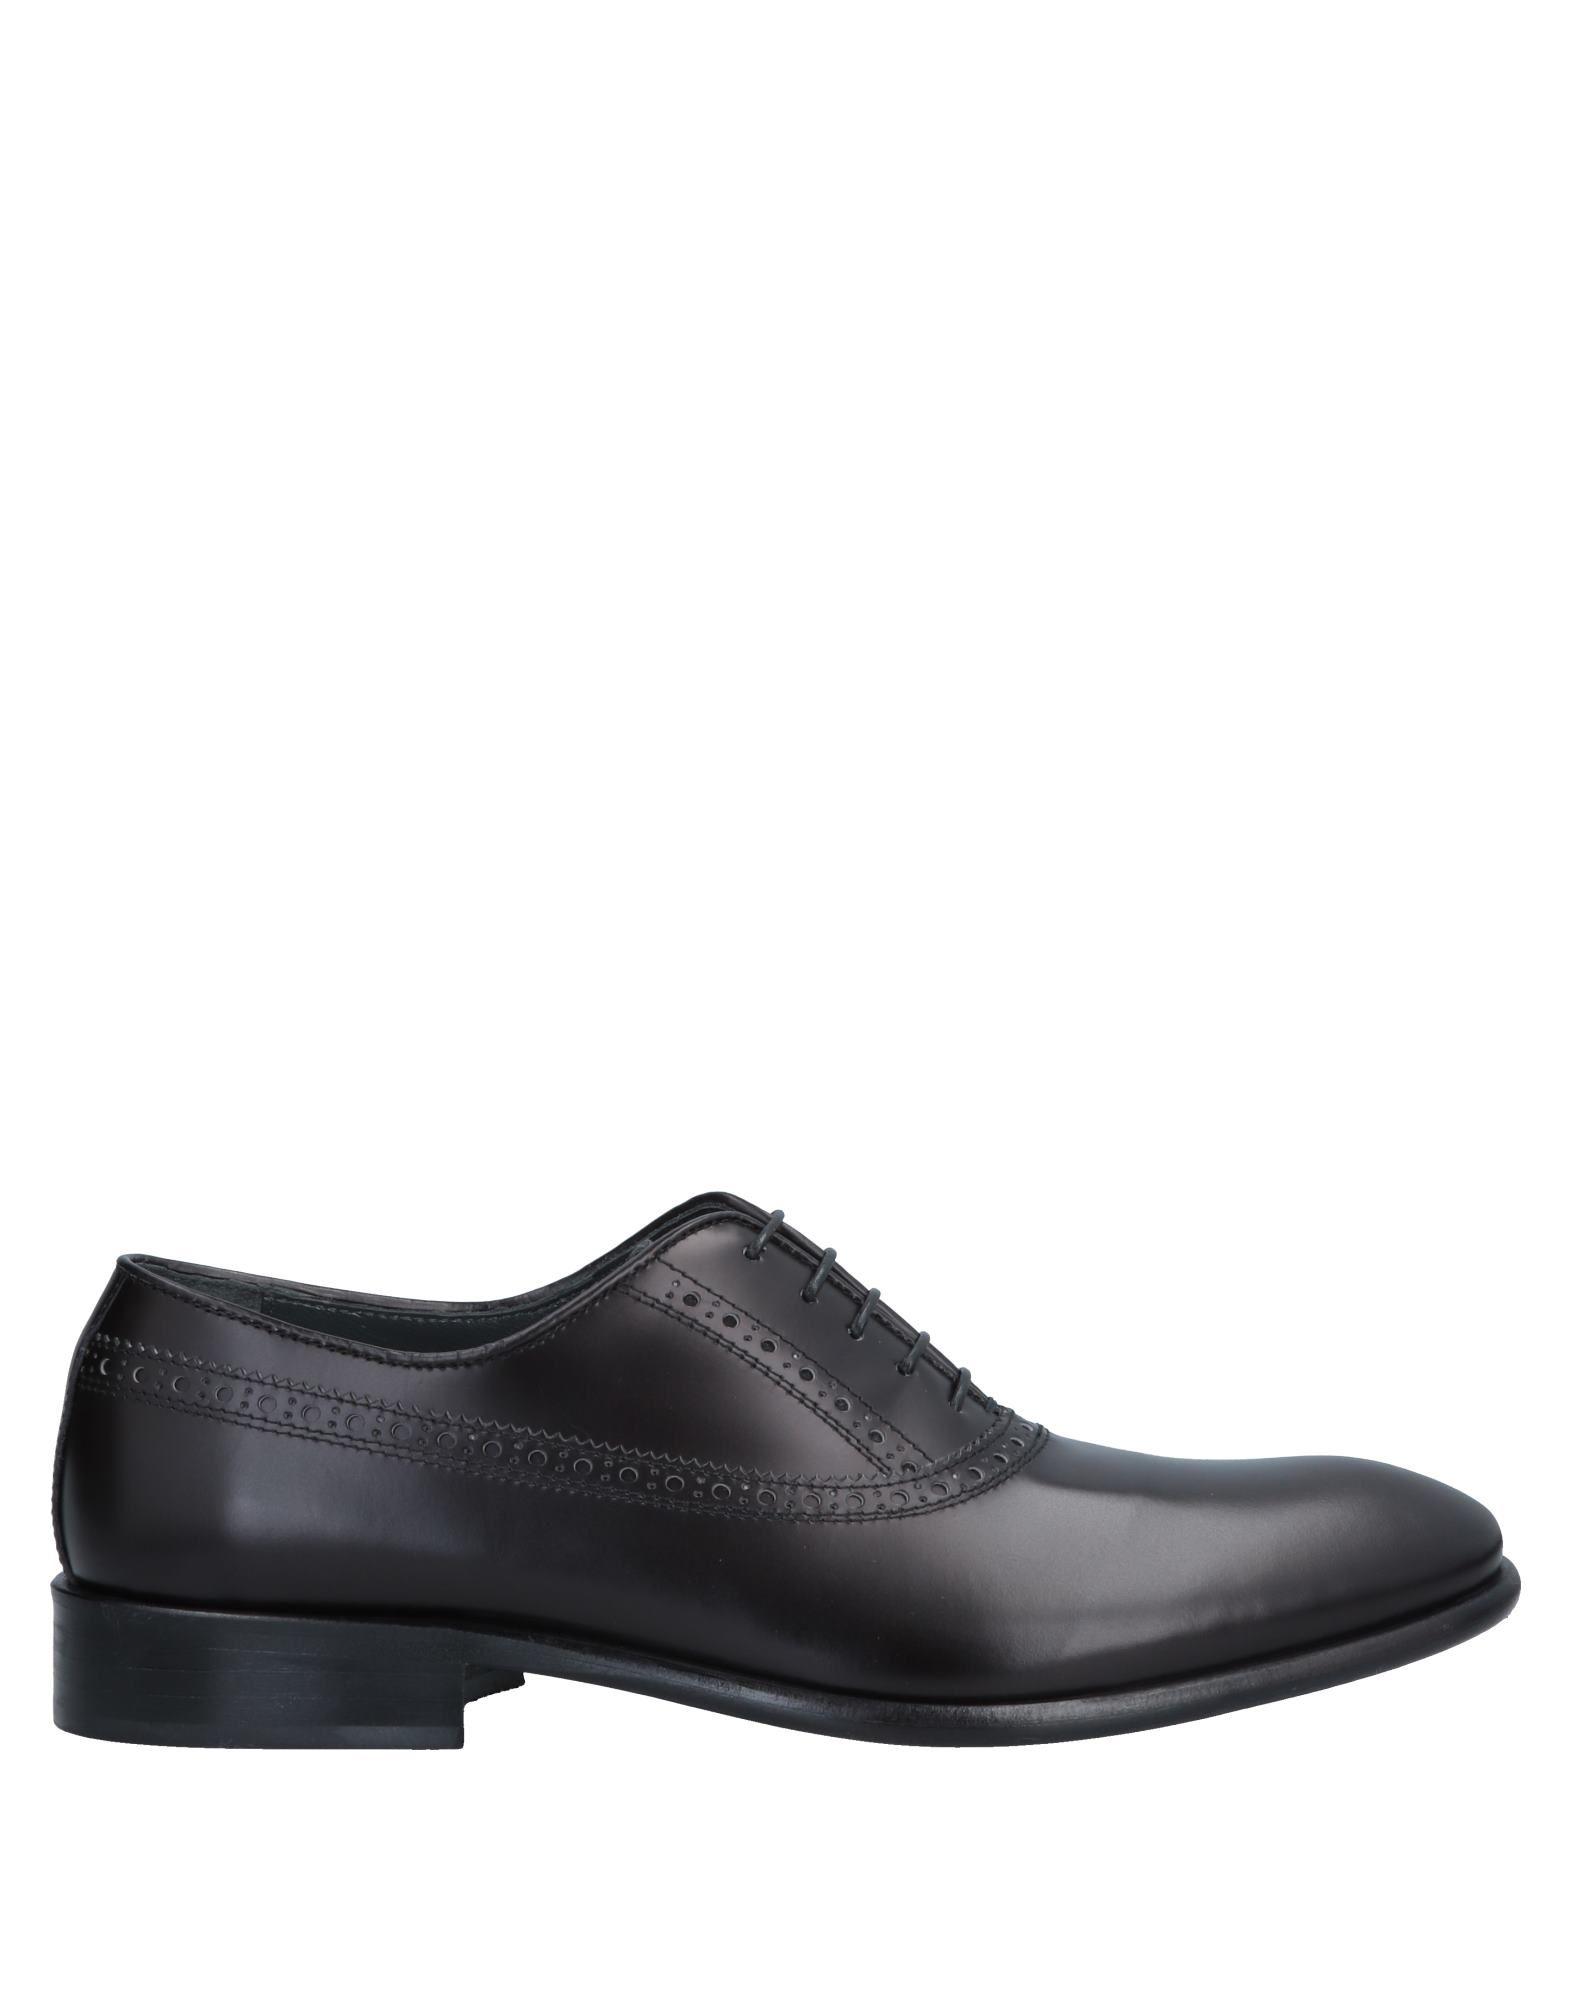 Фото - GIOVANNI CONTI Обувь на шнурках обувь на высокой платформе dkny